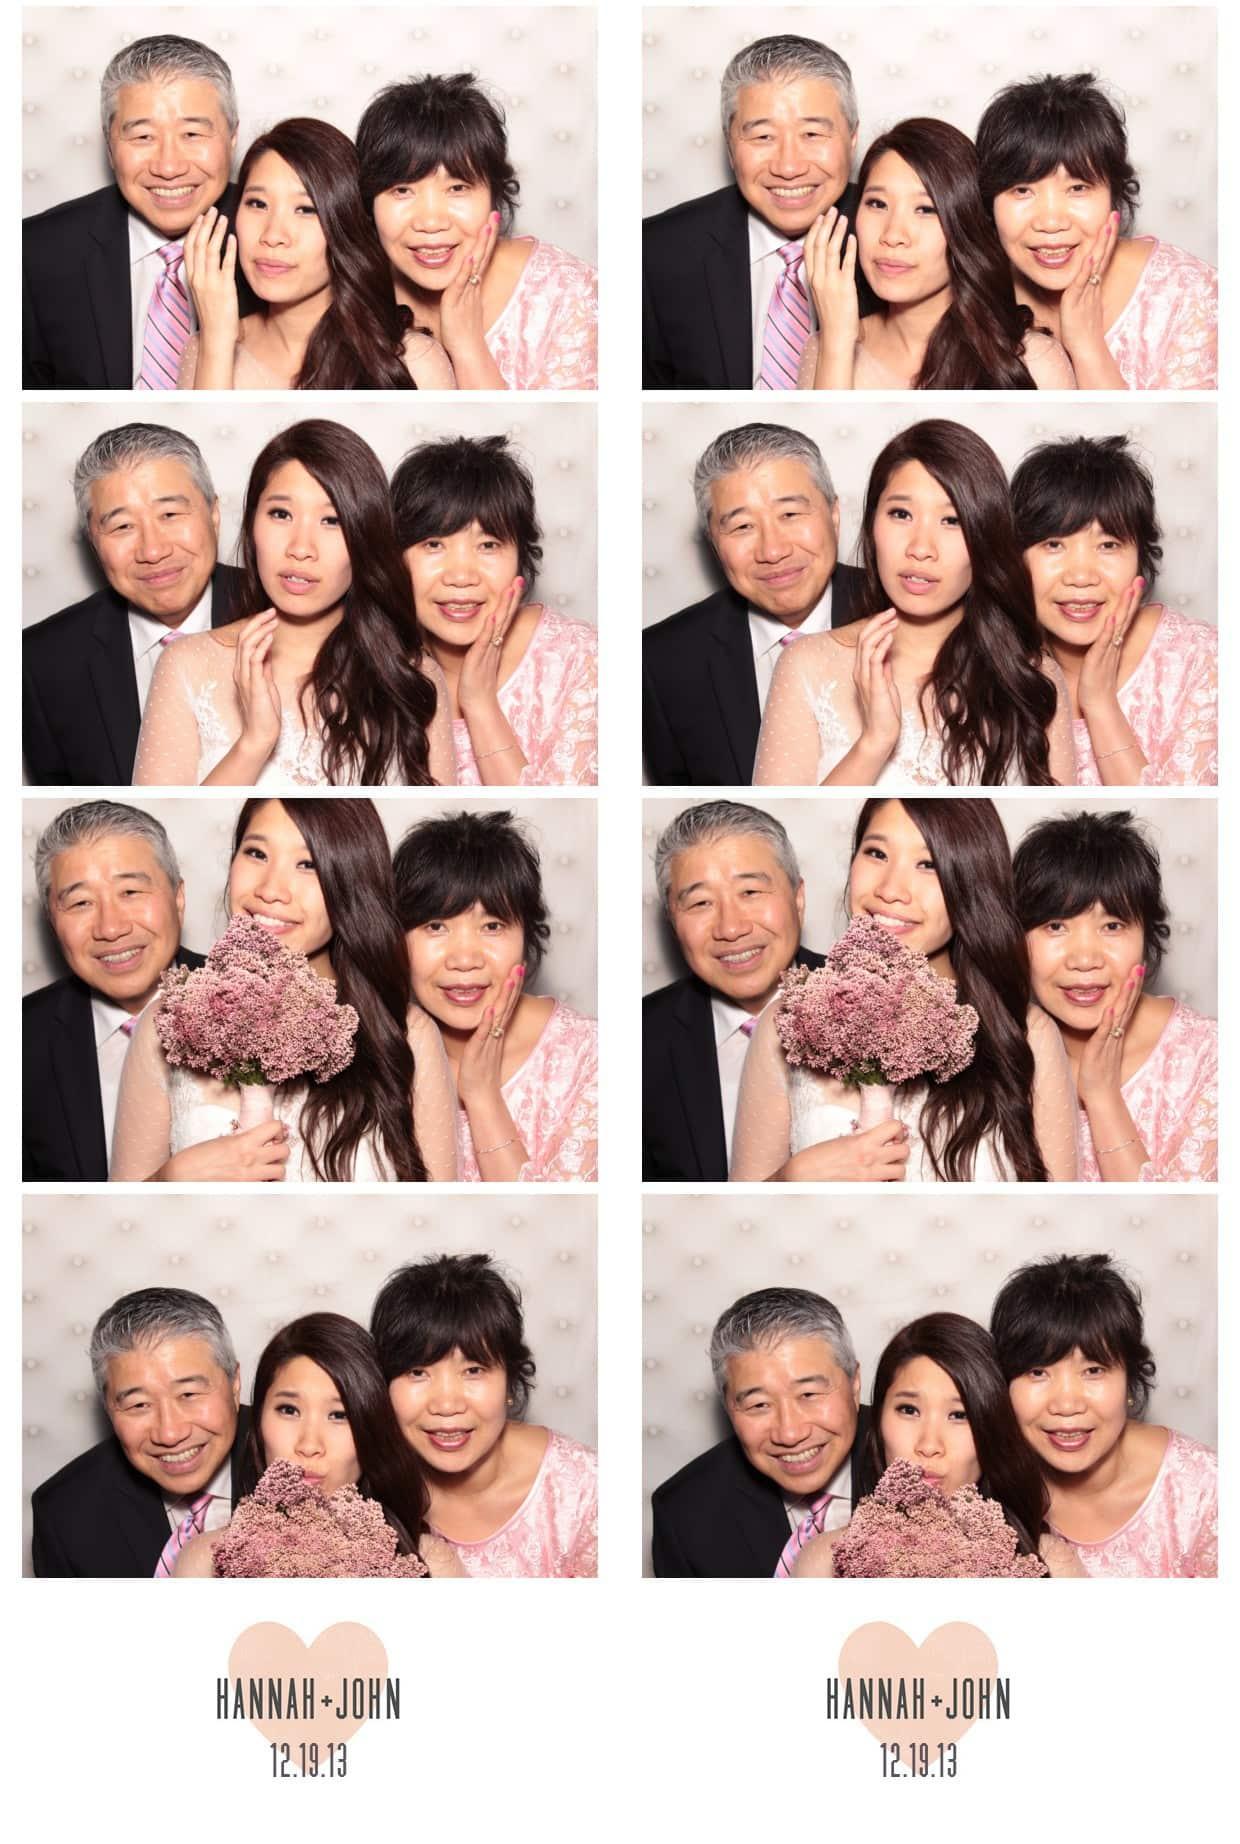 Wedding-Austin-Photobooth-Rental-Reception-No. 1-Backdrops-Photography-LGBT-Professional-Quality